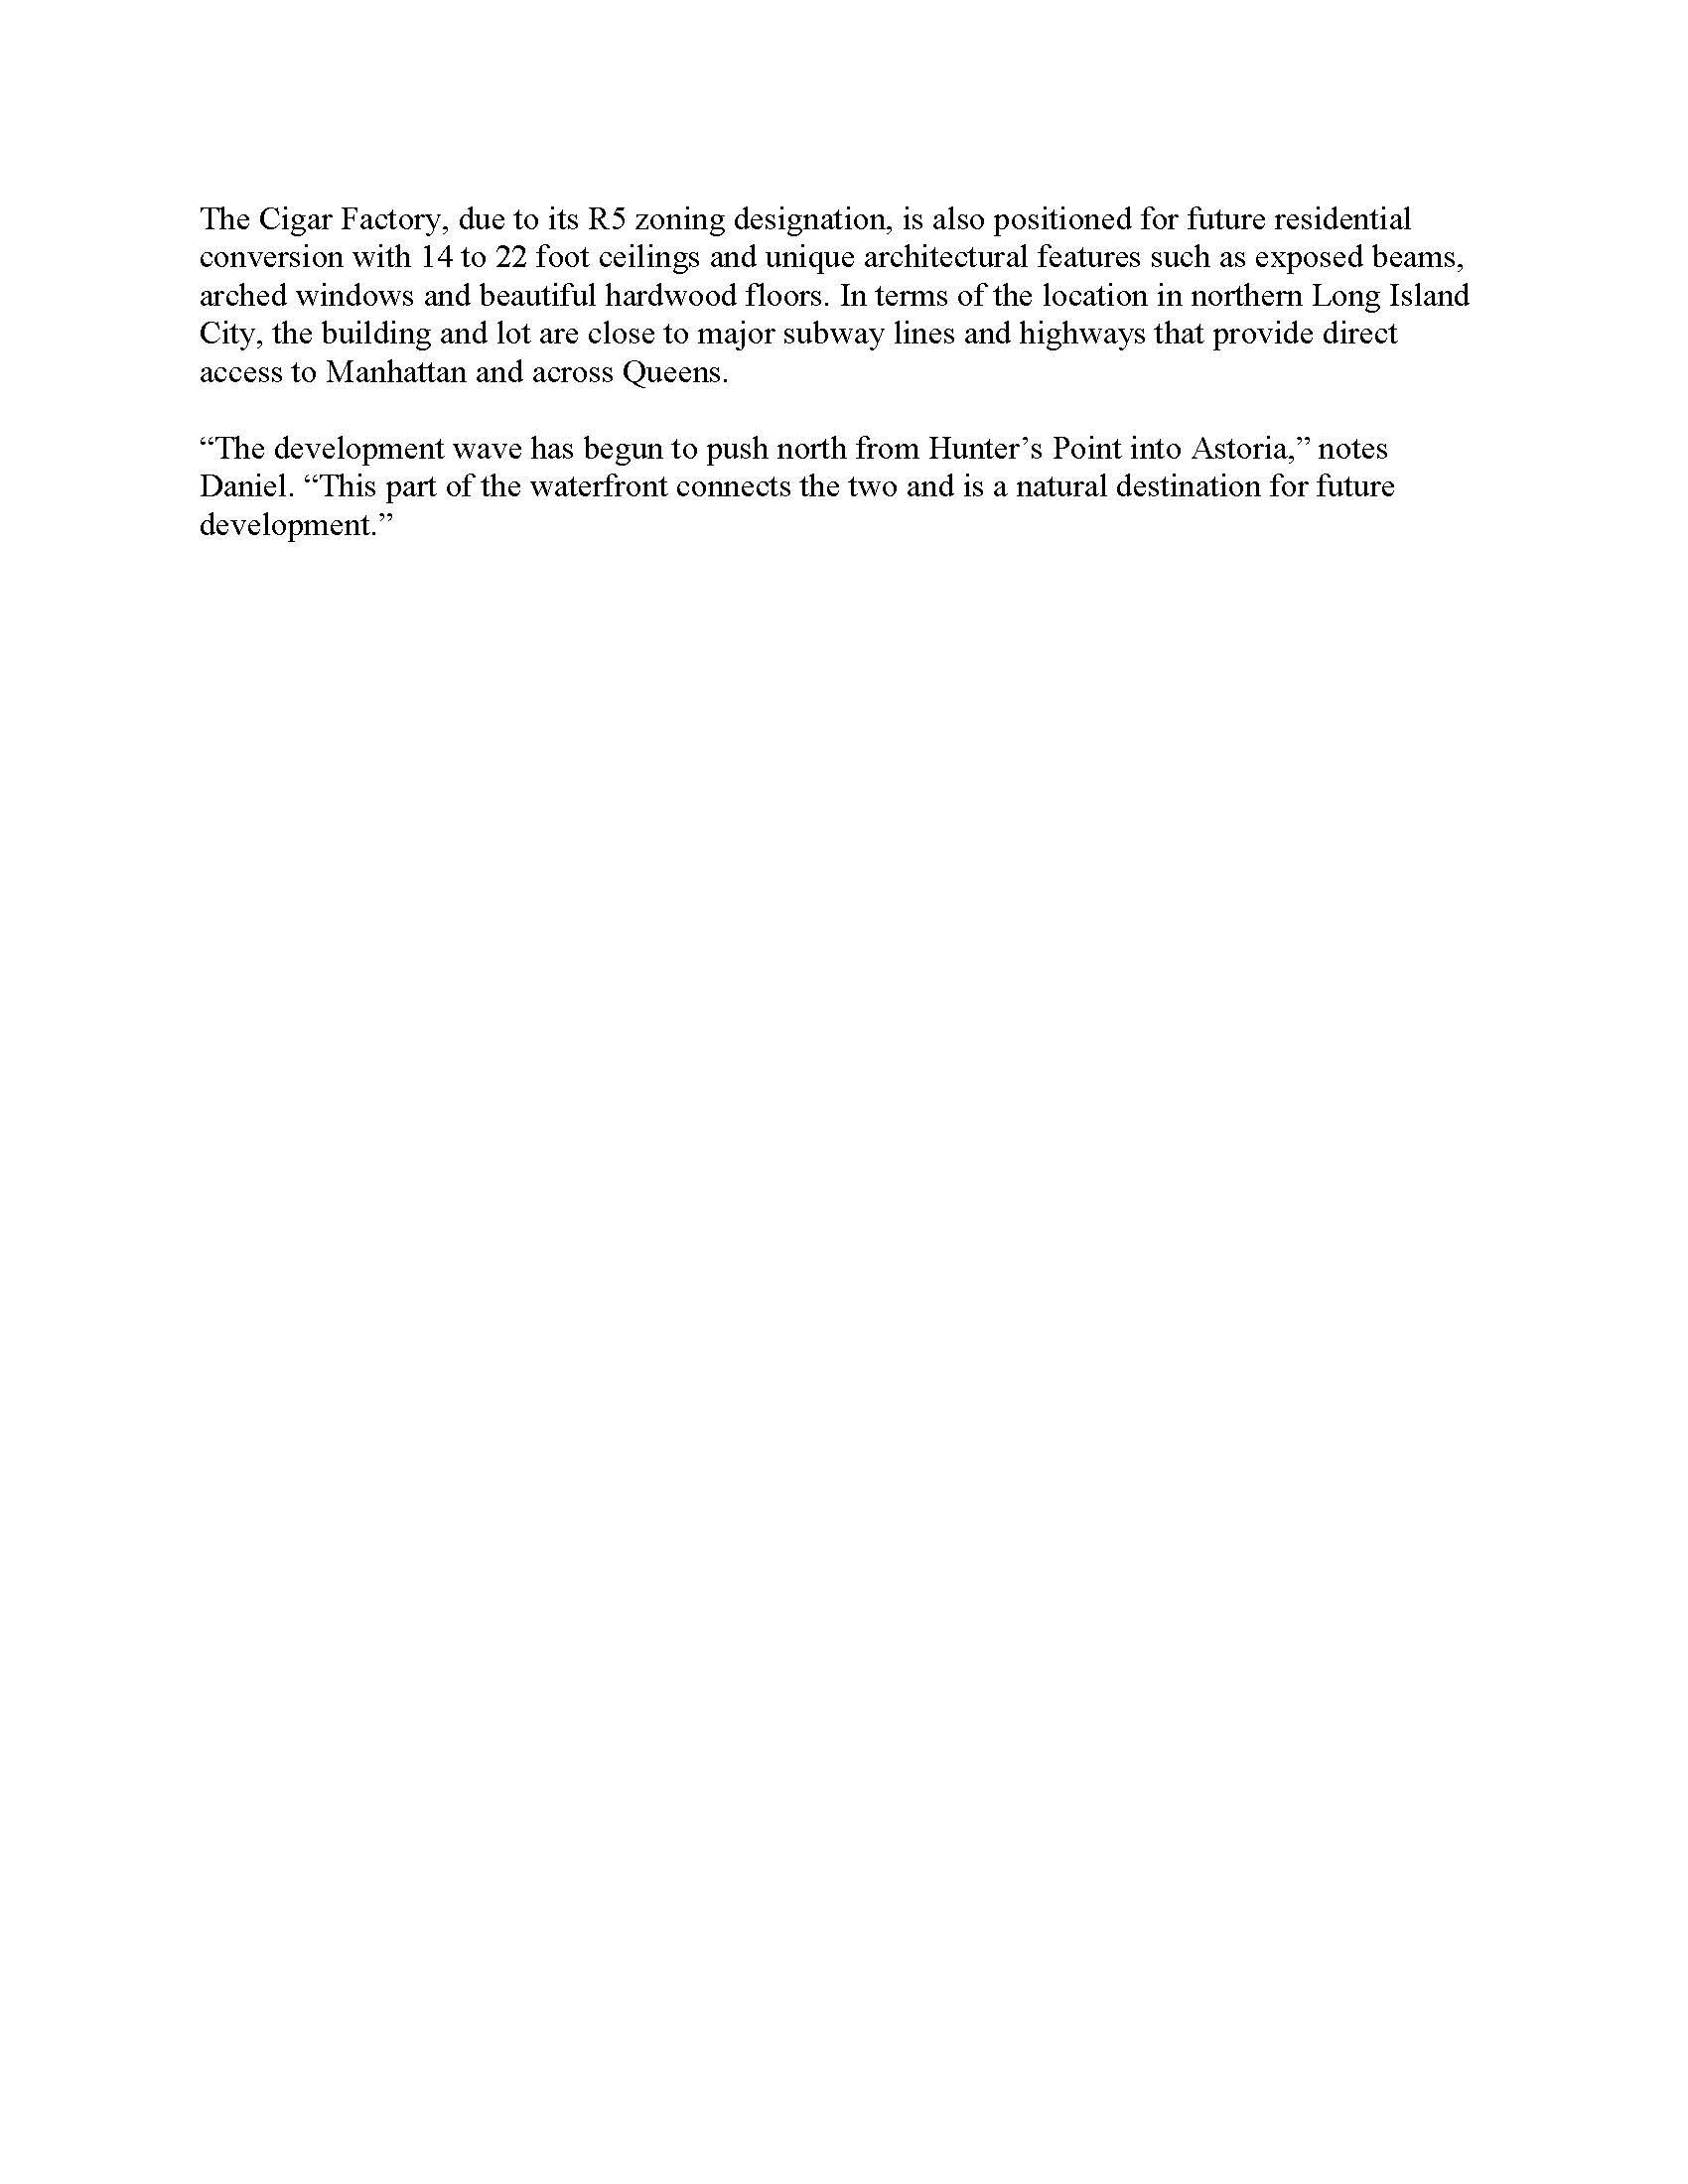 Cigar Factory Sale Globe St. 8 26 15_Page_2